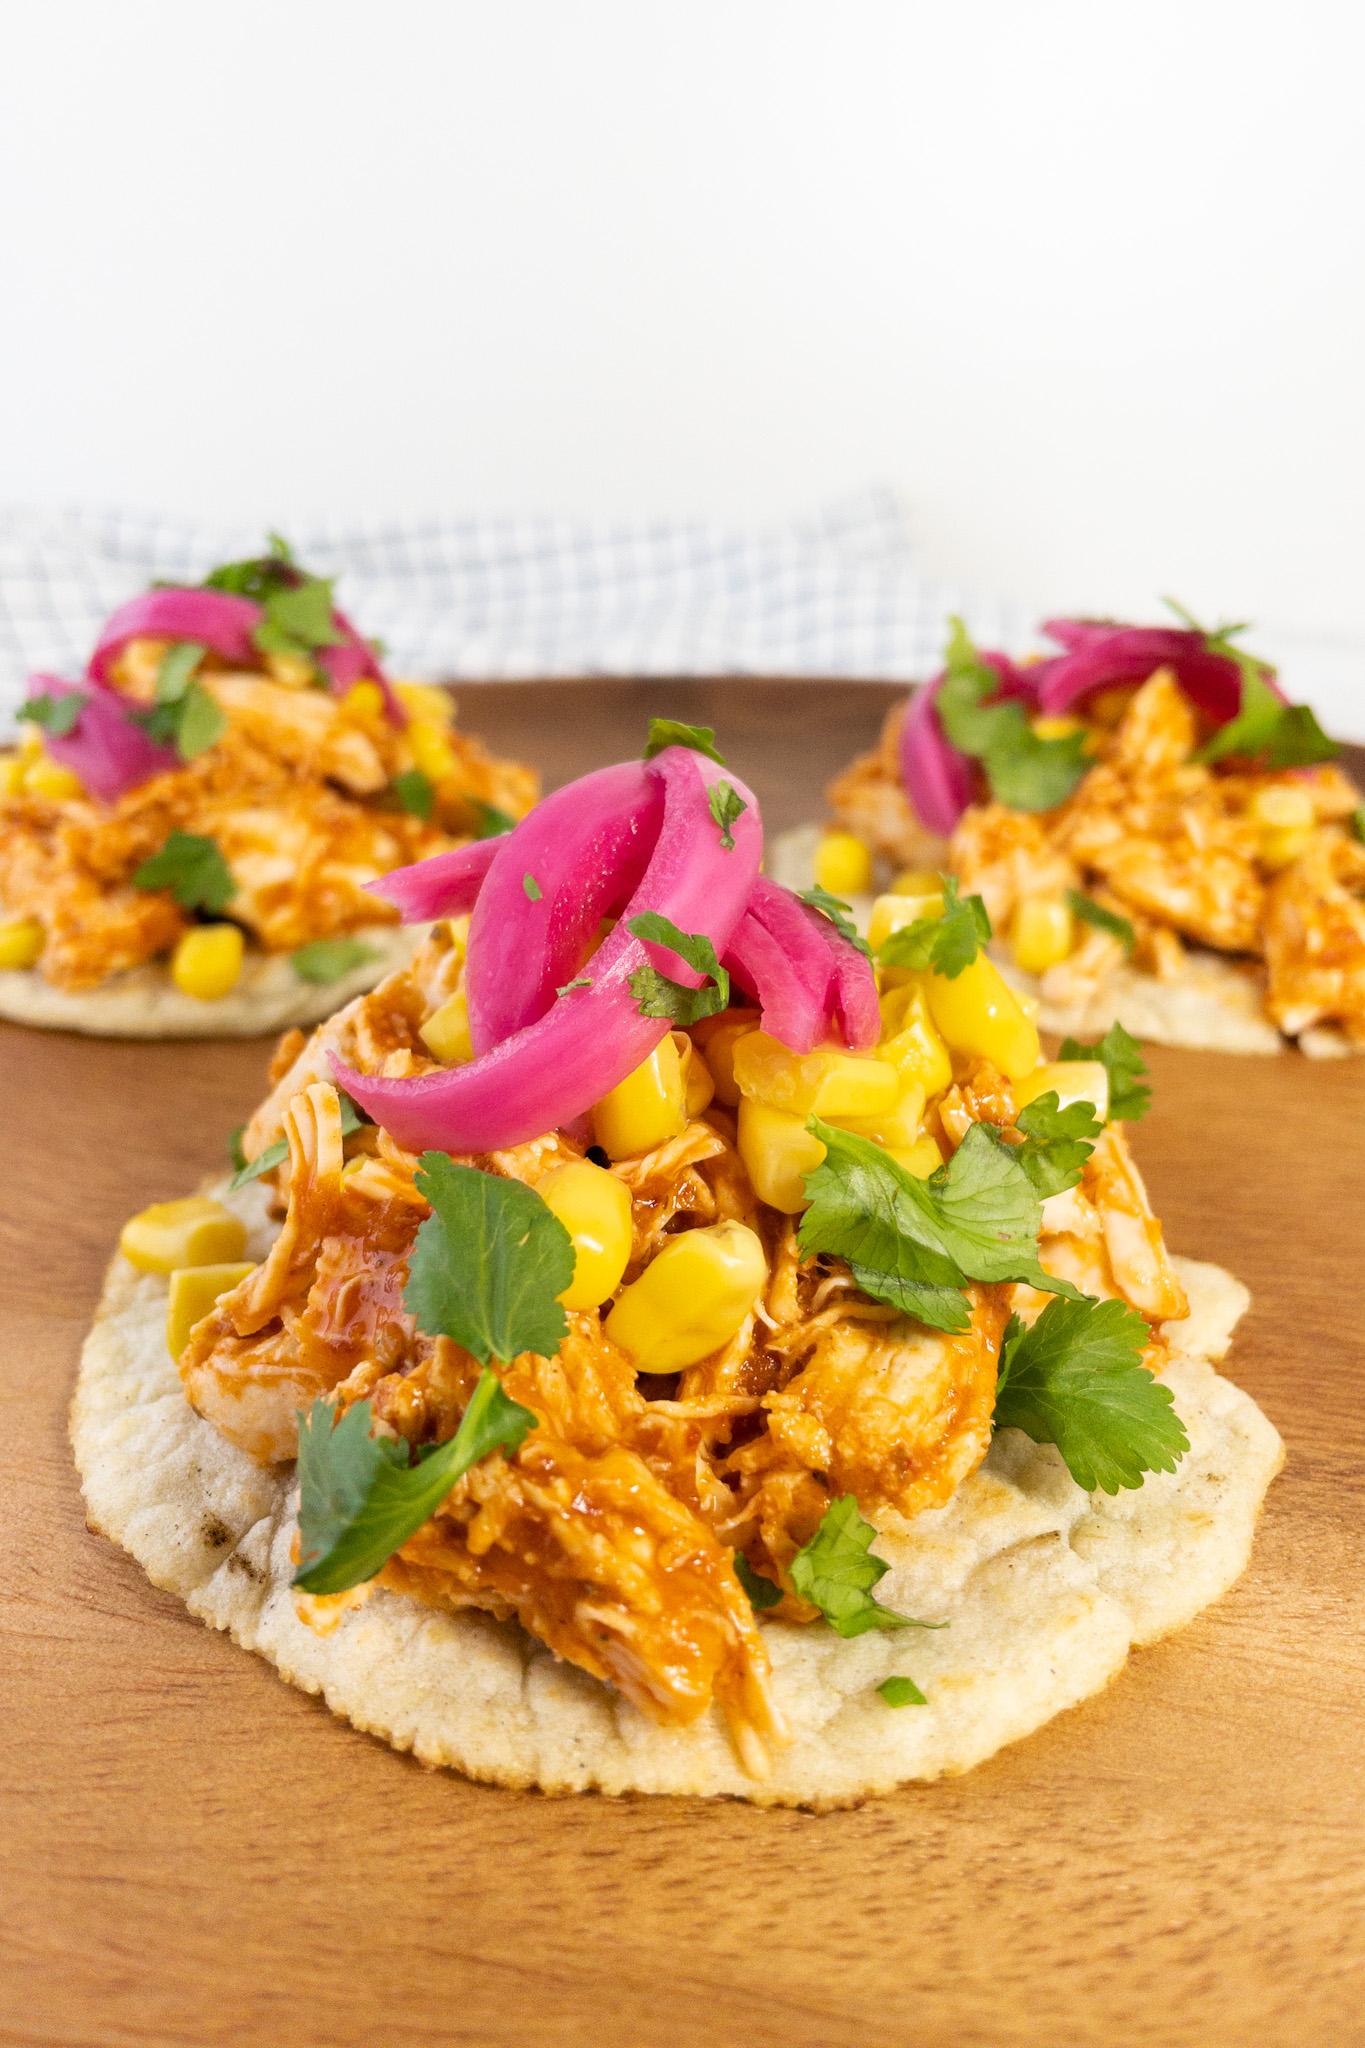 Mexicaanse taco's met kip, rode simpele enchilada saus, rode ingelegde ui en koriander